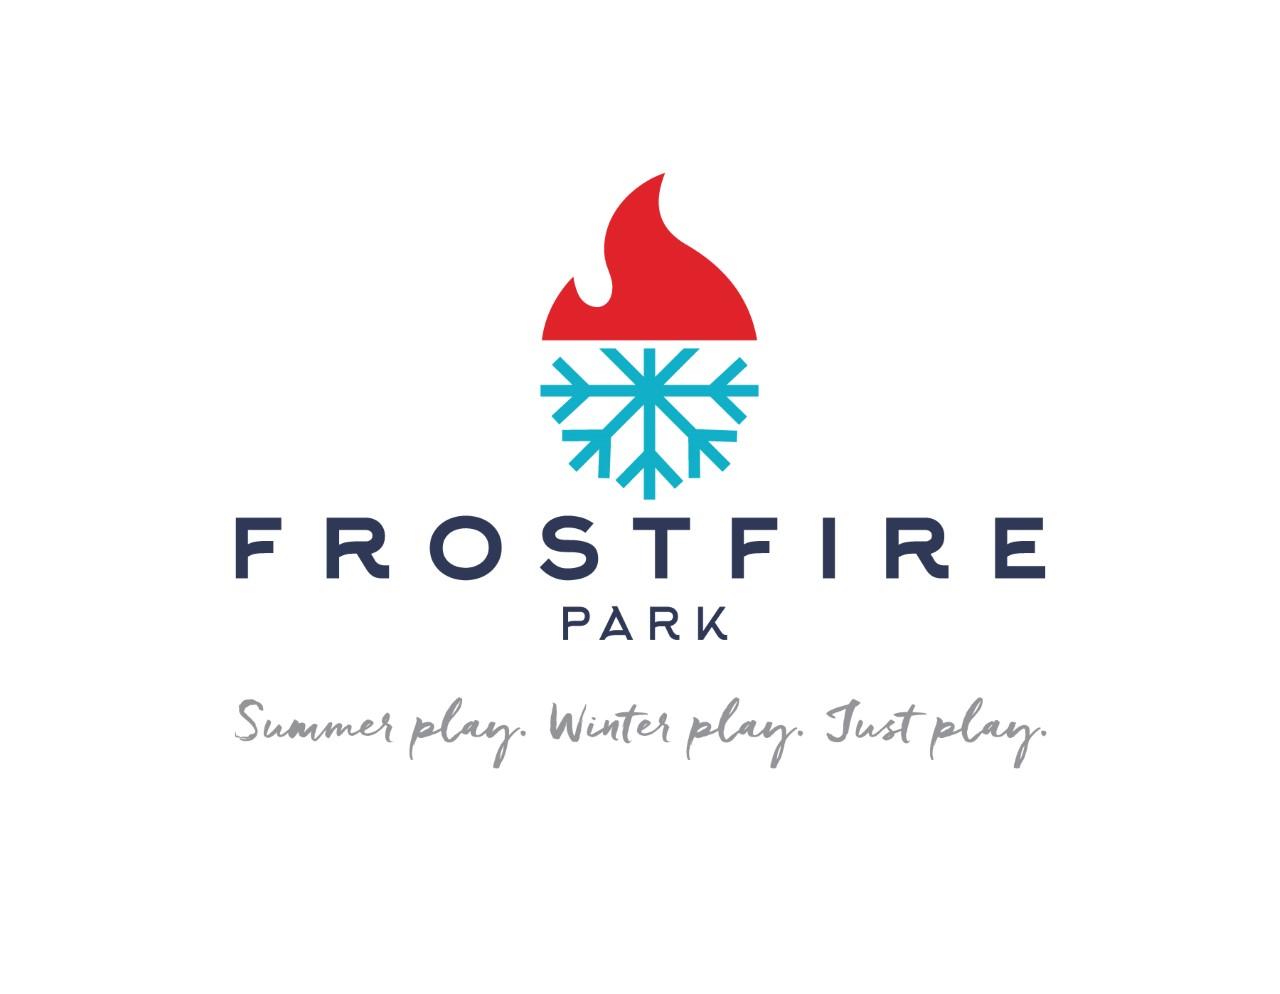 https://www.visionbanks.com/wp-content/uploads/thumbnail_FrostFire-Logo-Tagline-FC.jpg